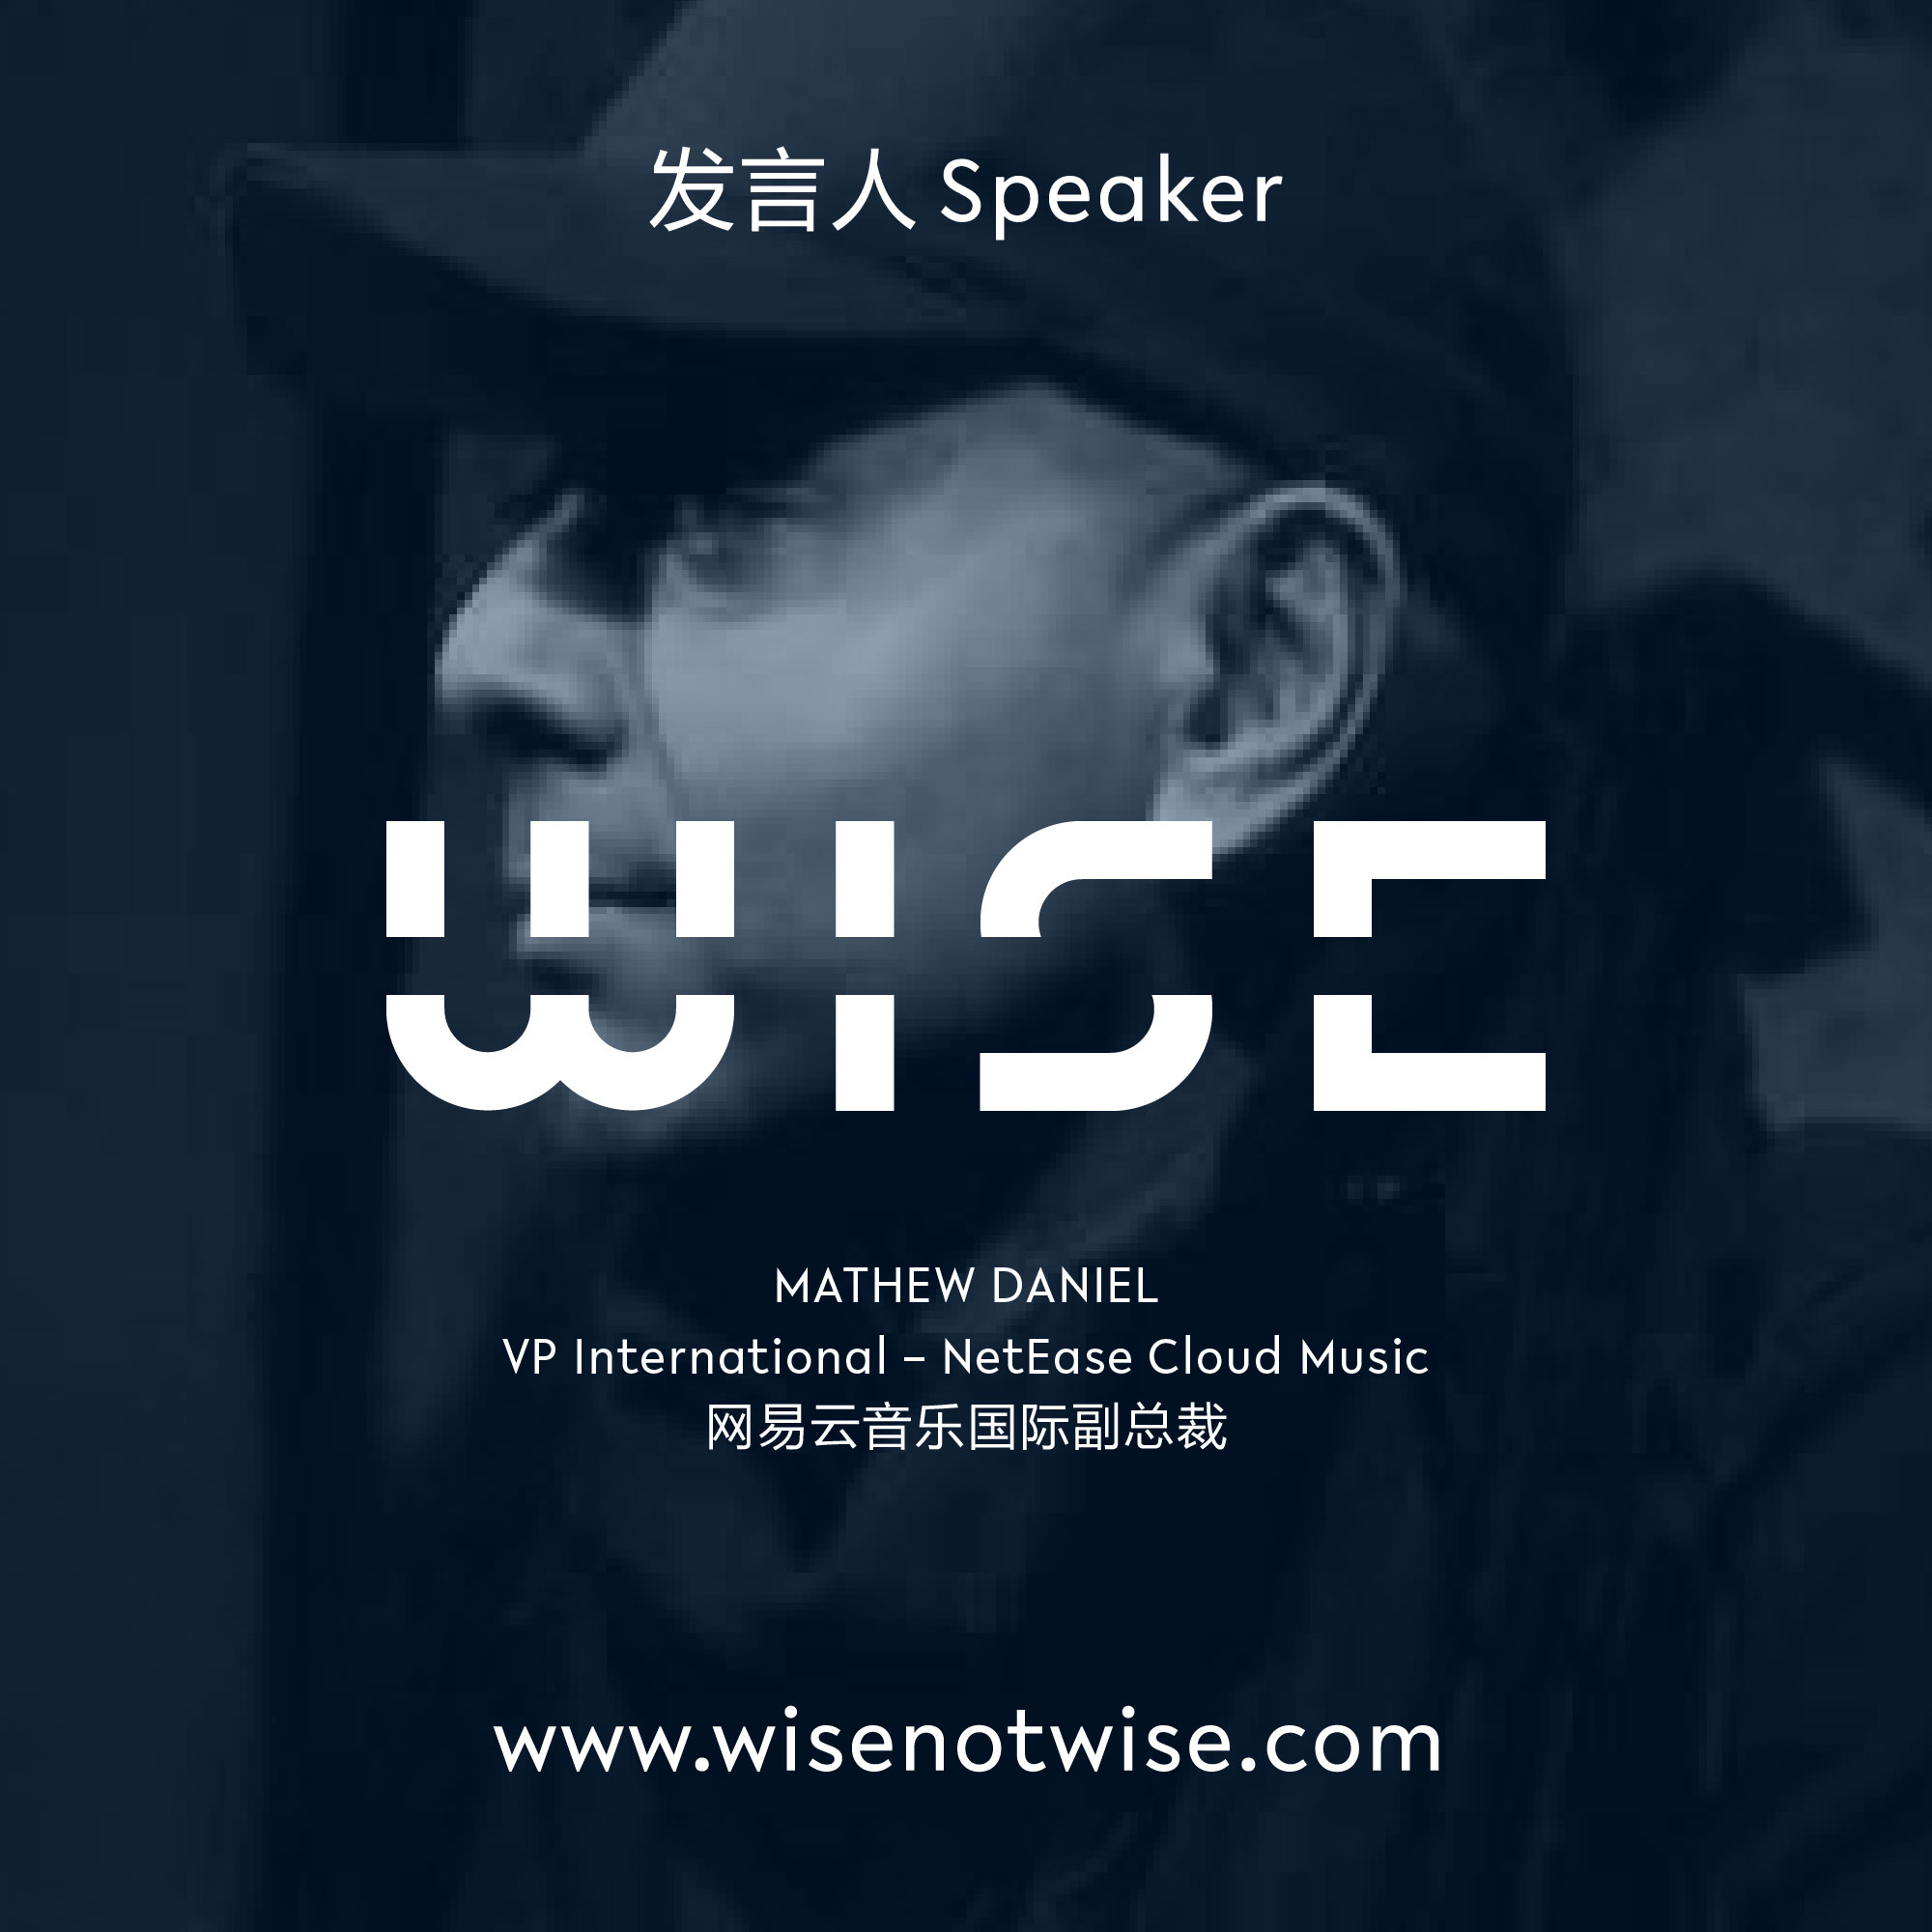 Mathew Daniel (Vice President International of NetEase Cloud Music)